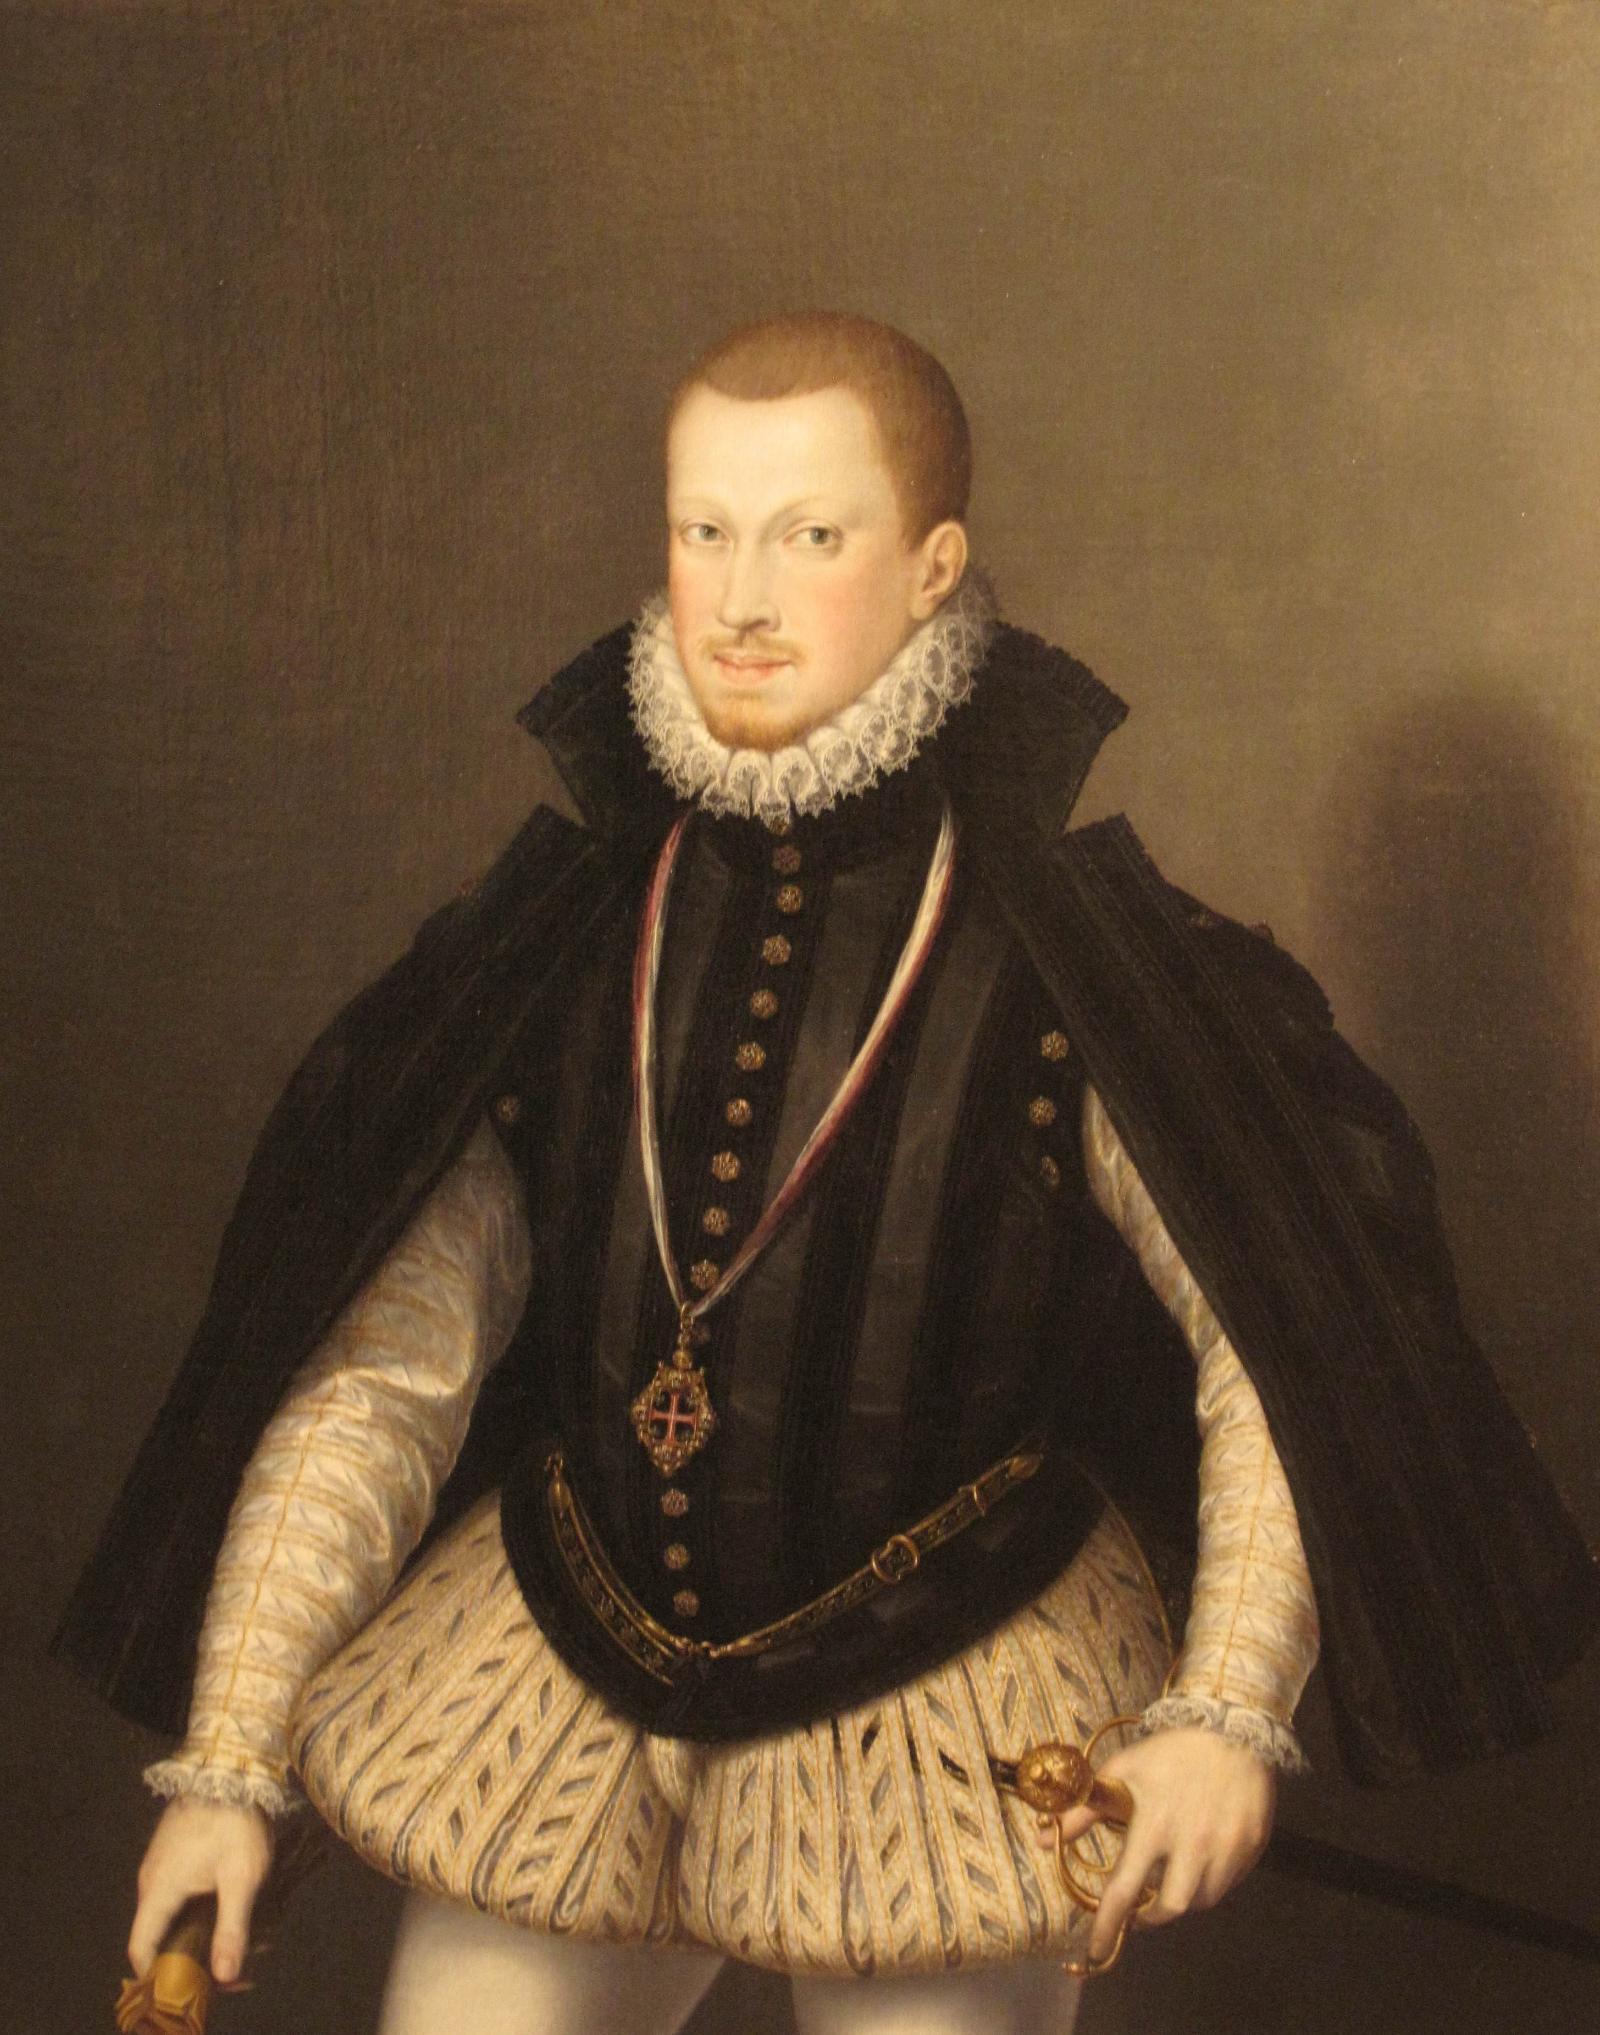 Себастьян I. Алонсо Санчес Коэльо, 1575.